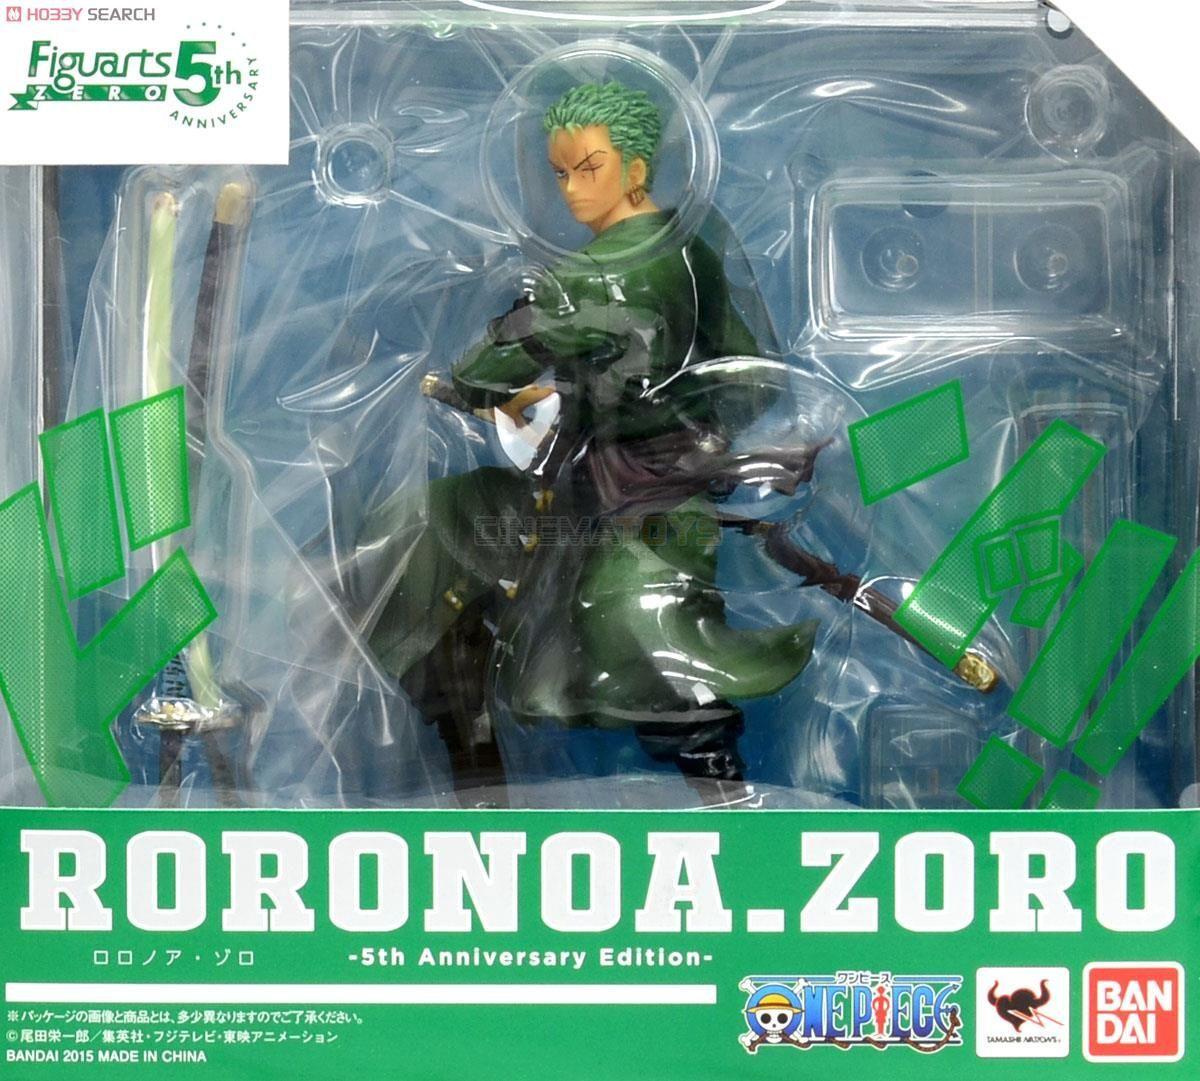 ONE PIECE Figuarts ZERO Roronoa Zoro 5th Edition Static Figure Bandai Tamashii